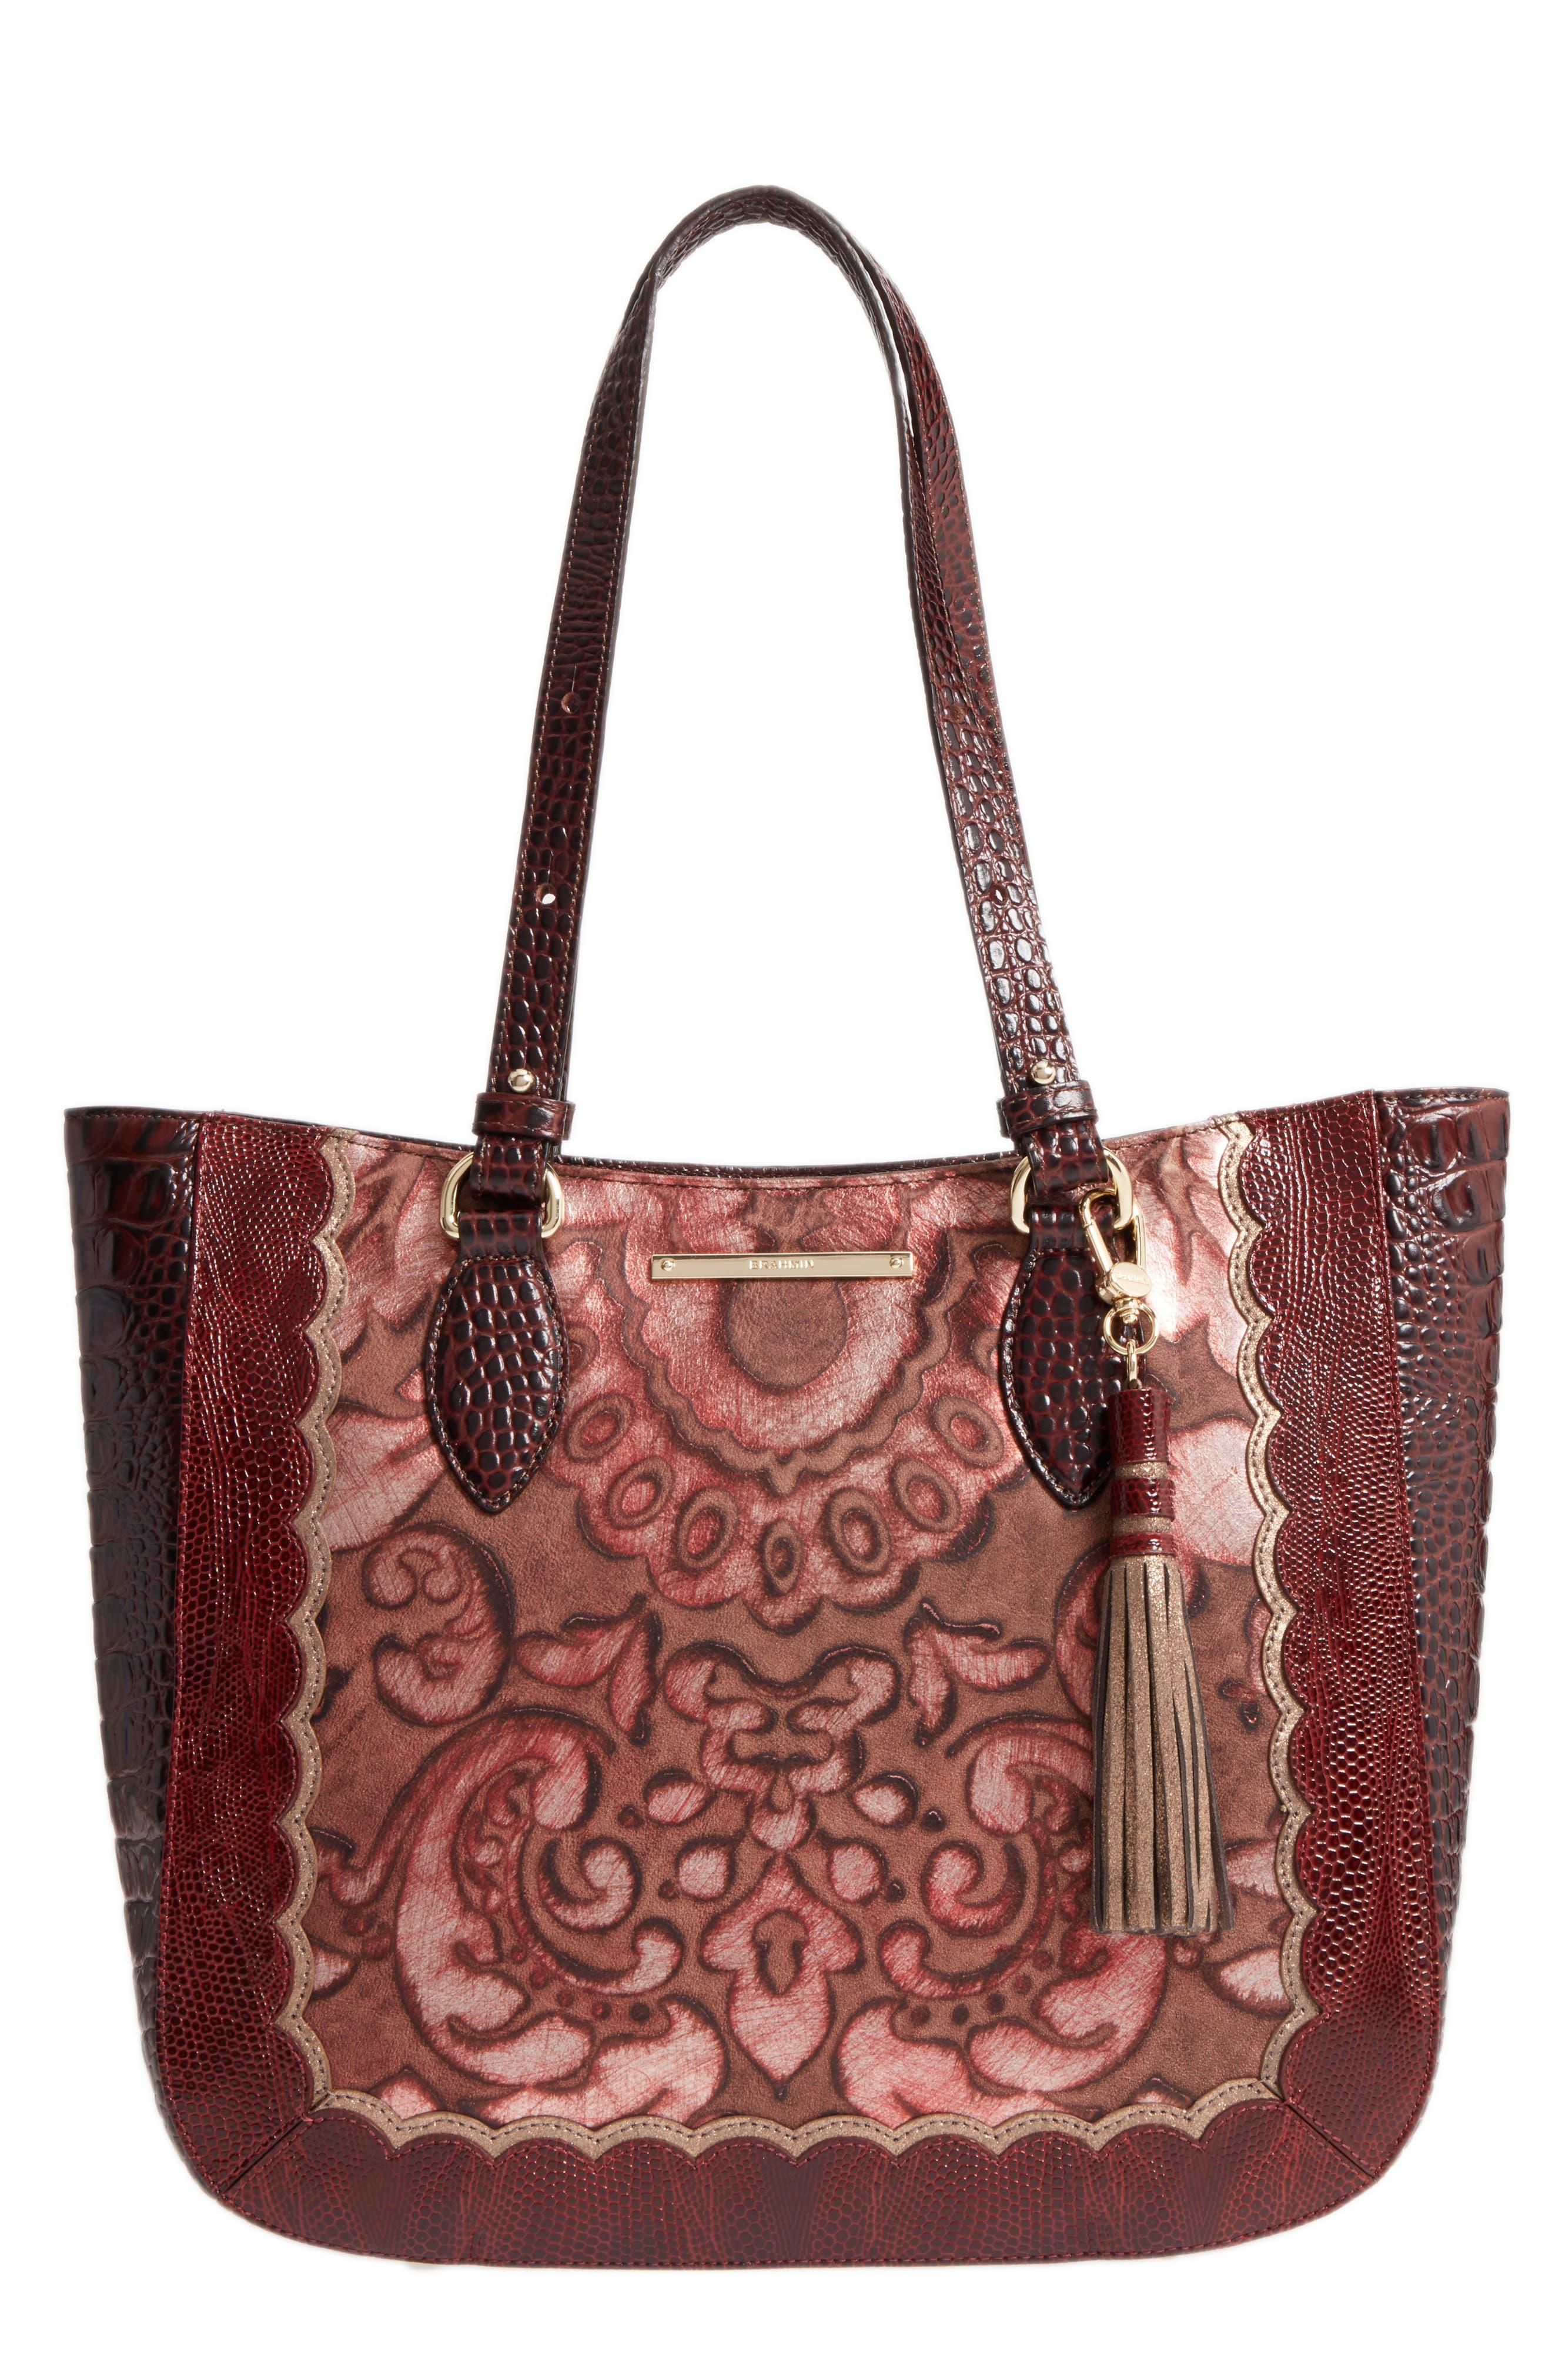 Brahmin Medium Red Verona - Lena Leather Tote